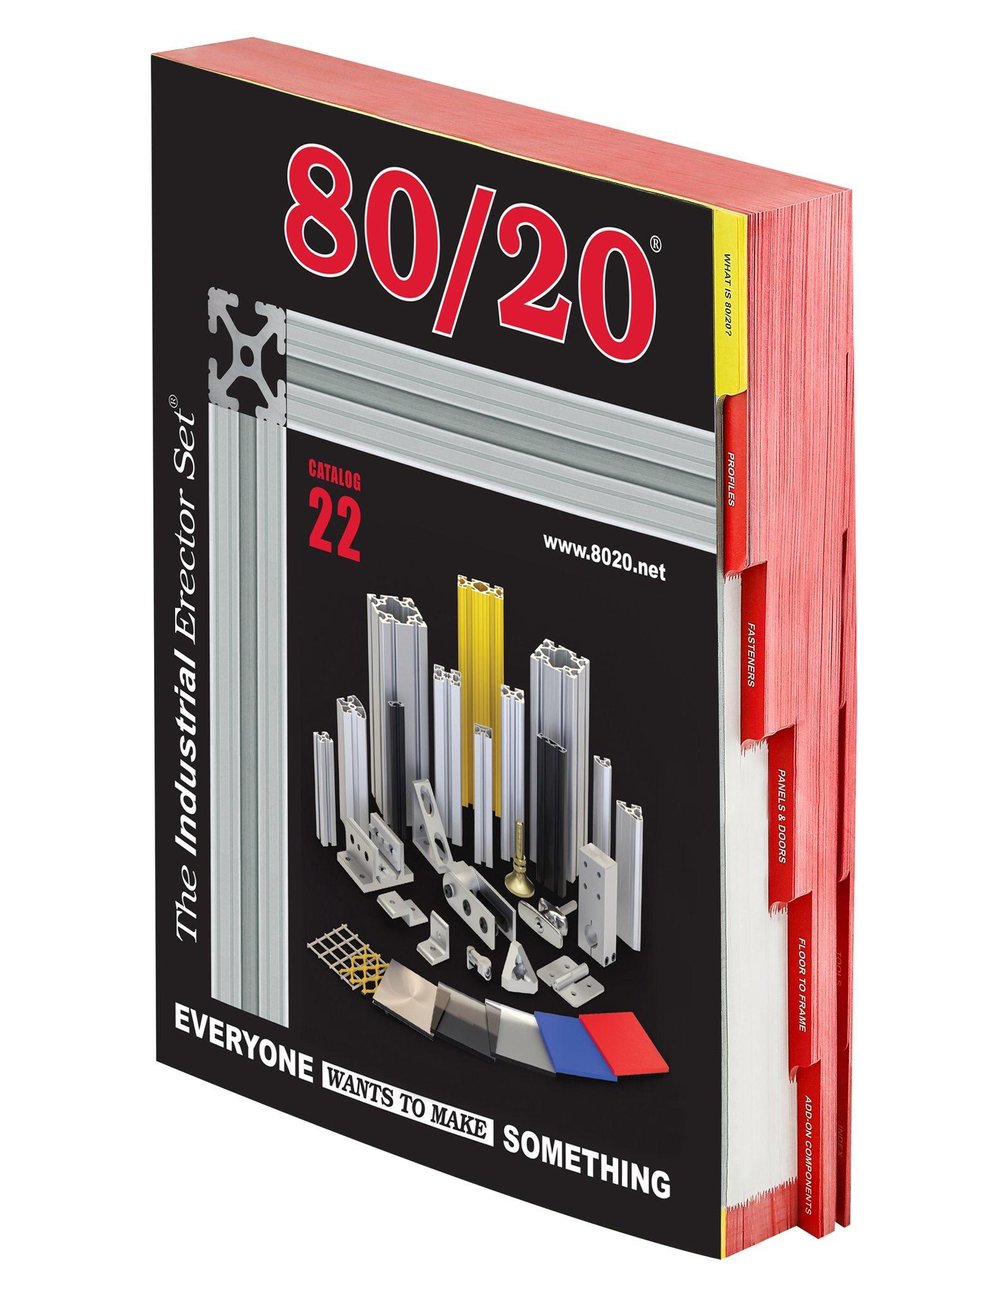 808 catalog.jpeg